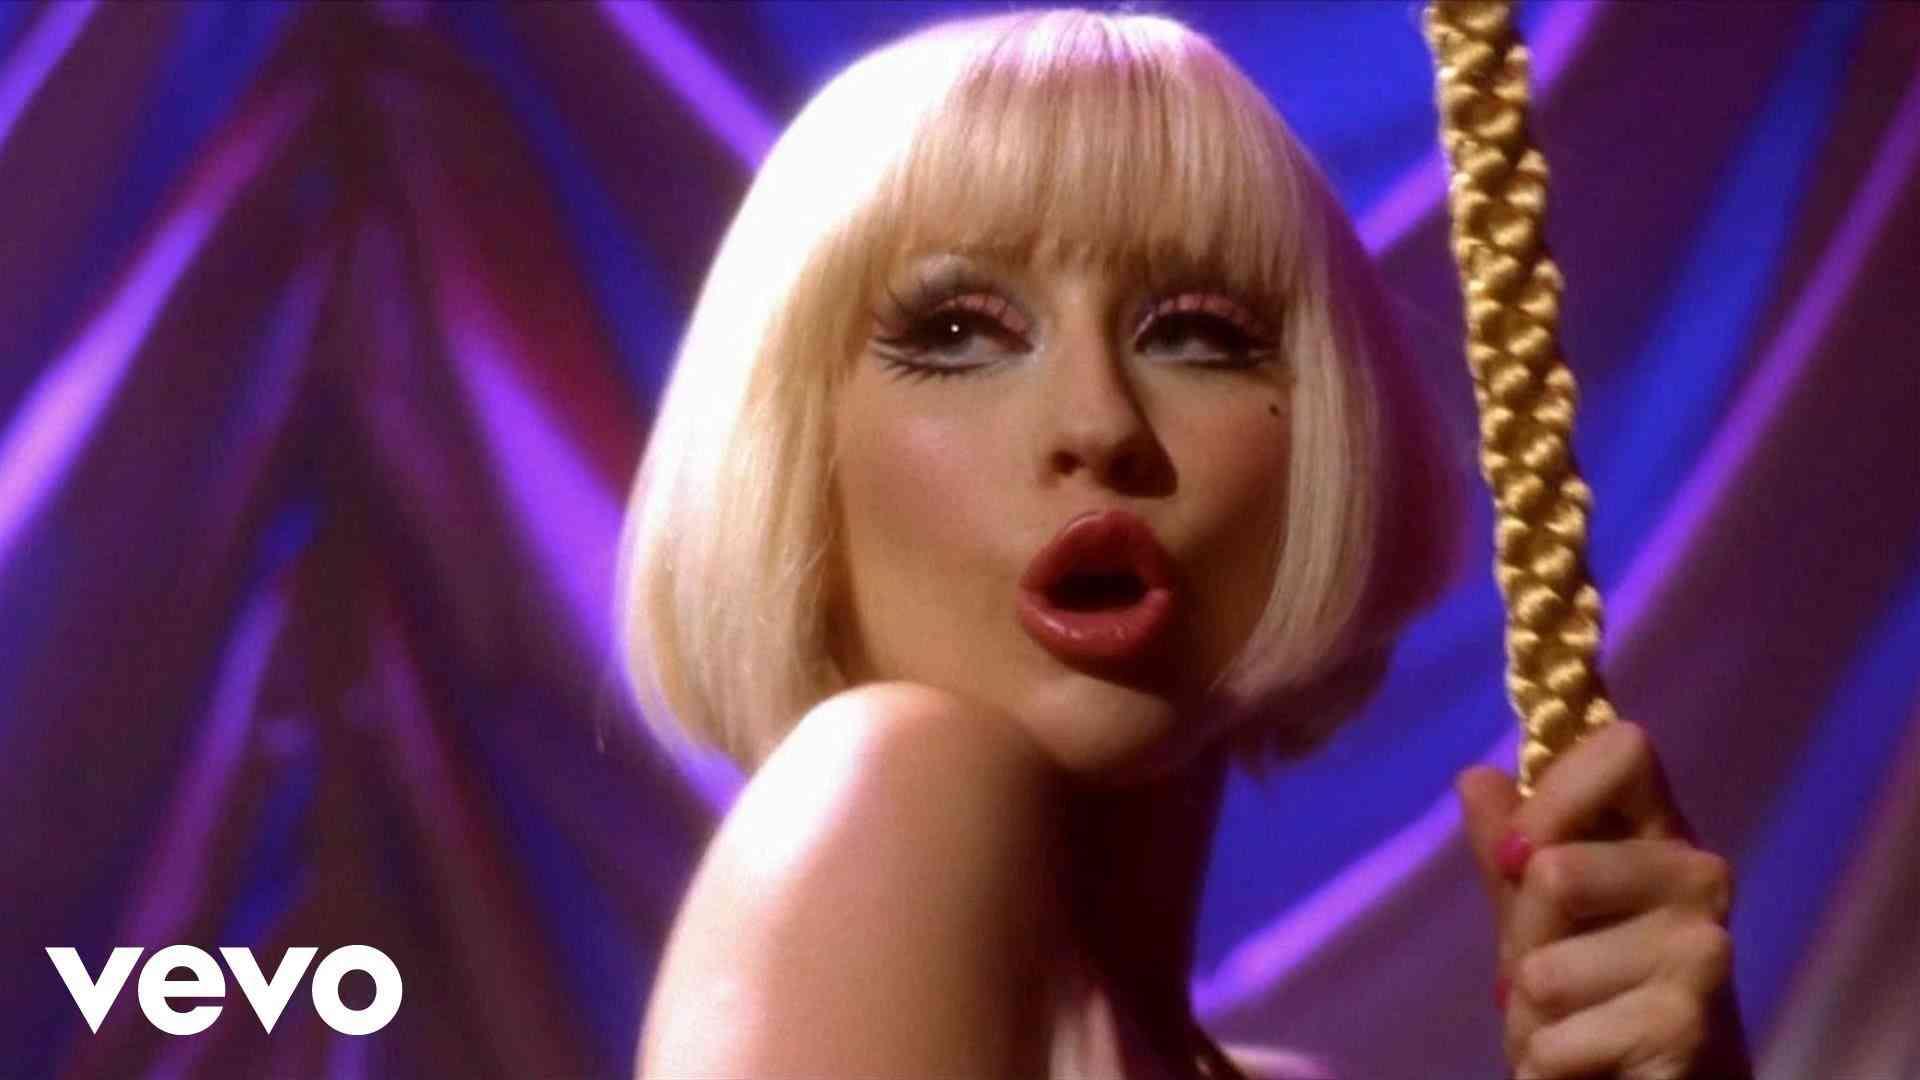 Christina Aguilera - I'm a Good Girl (Burlesque) - YouTube